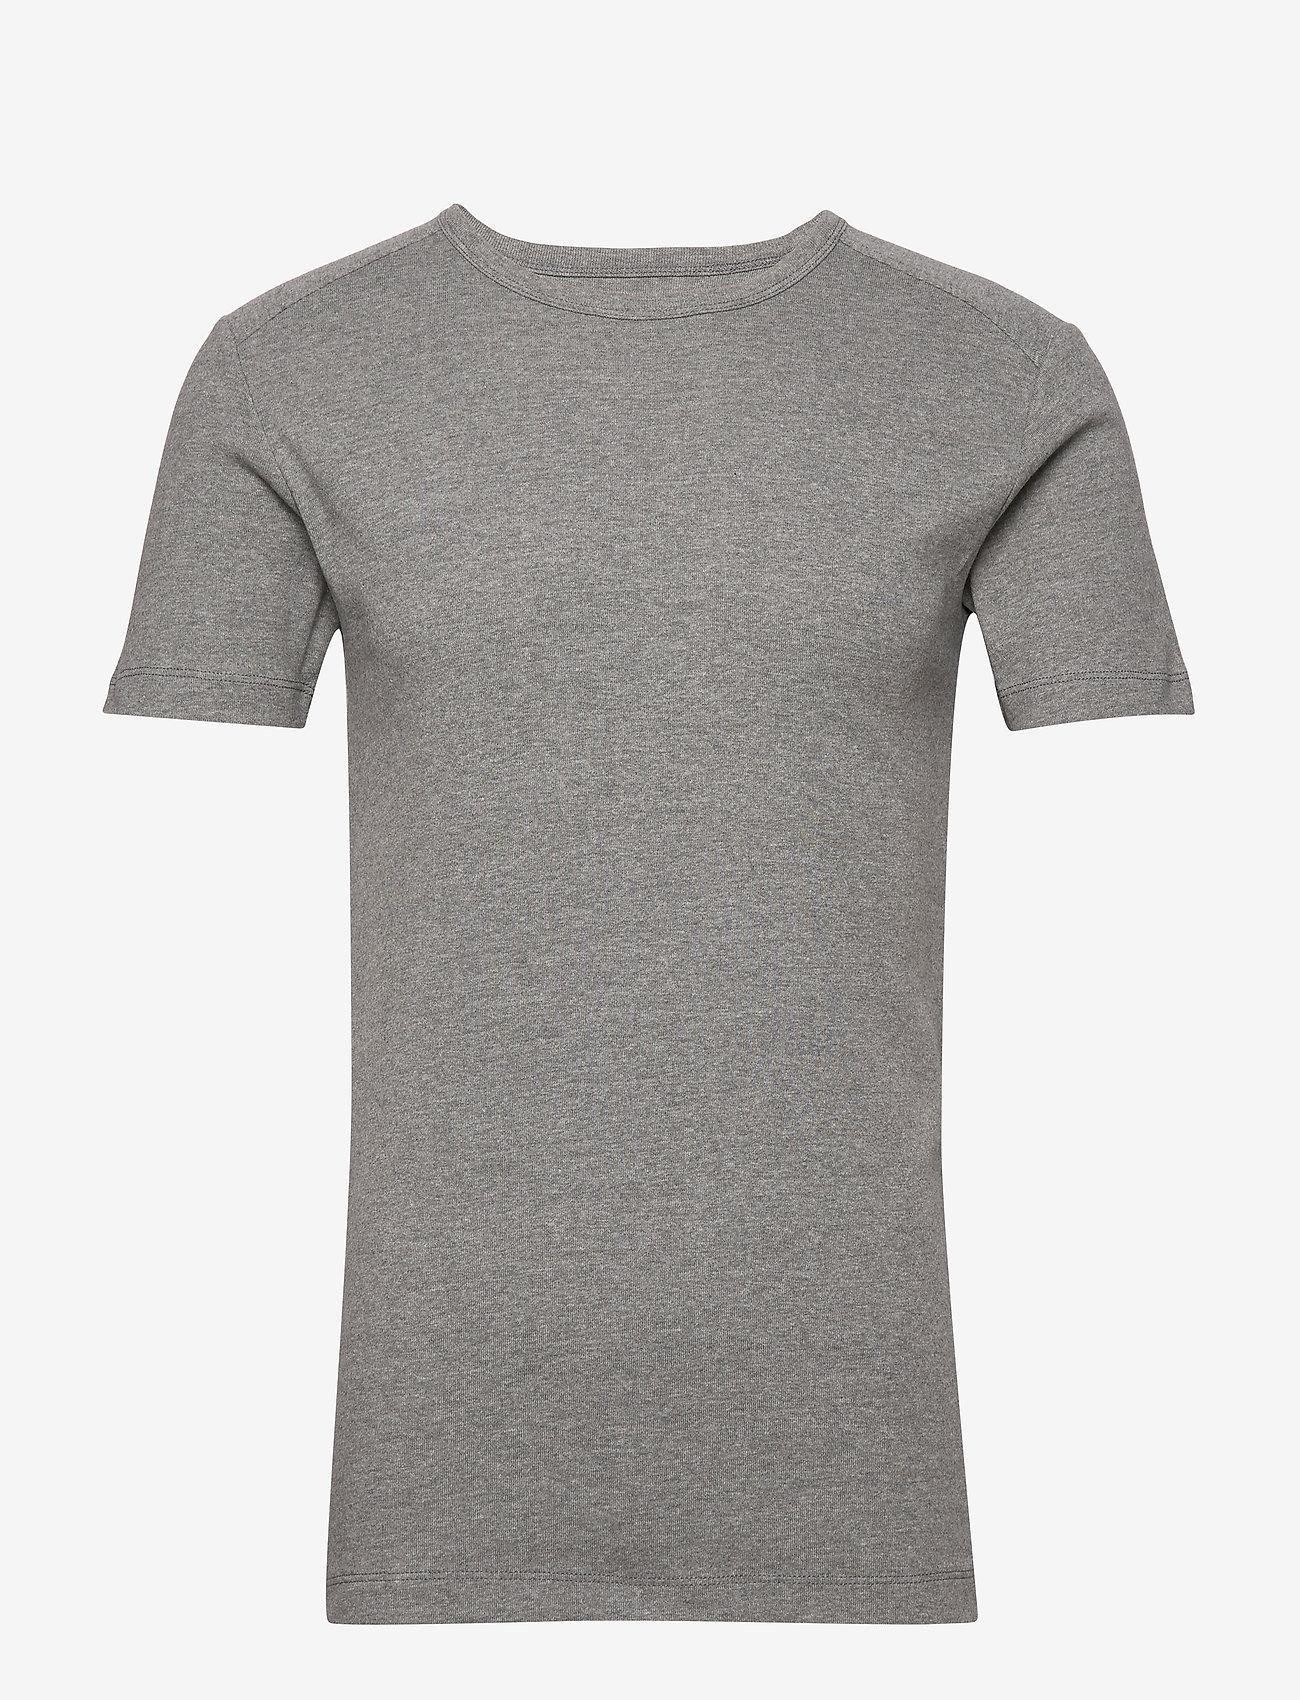 Esprit Casual - T-Shirts - basic t-shirts - medium grey - 0